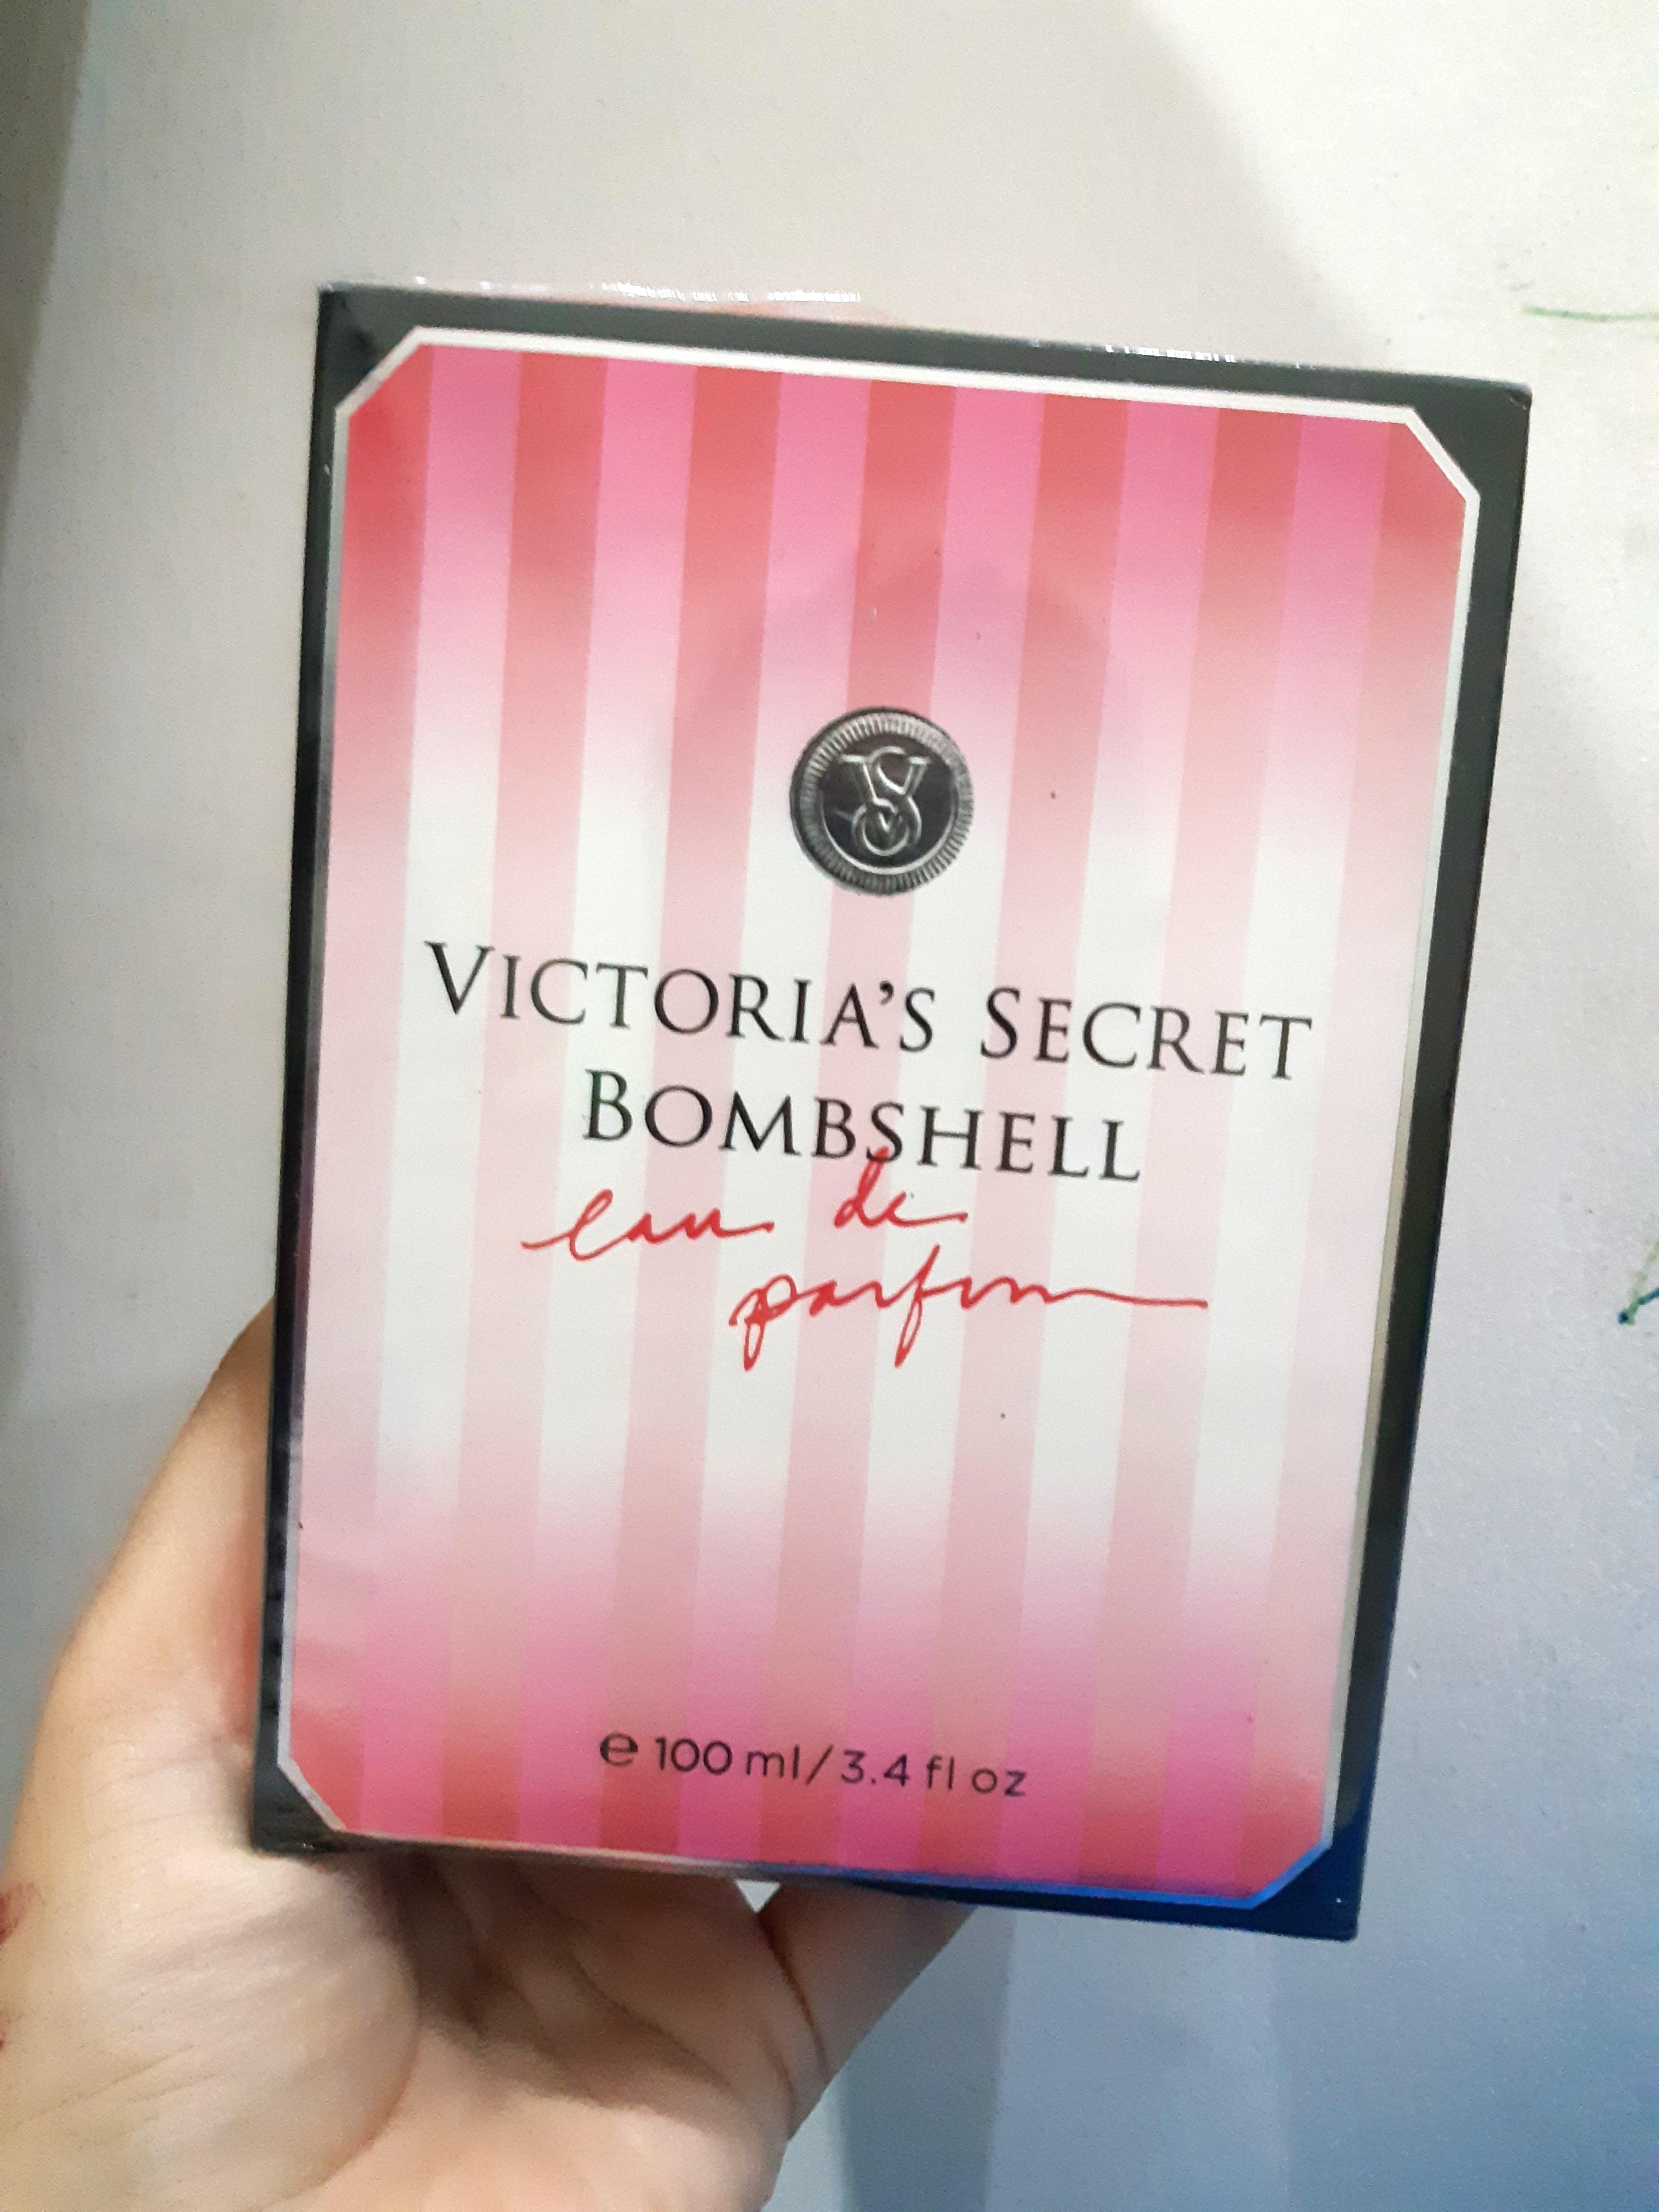 #visitsingapore Victoria'S Secret Bombshell